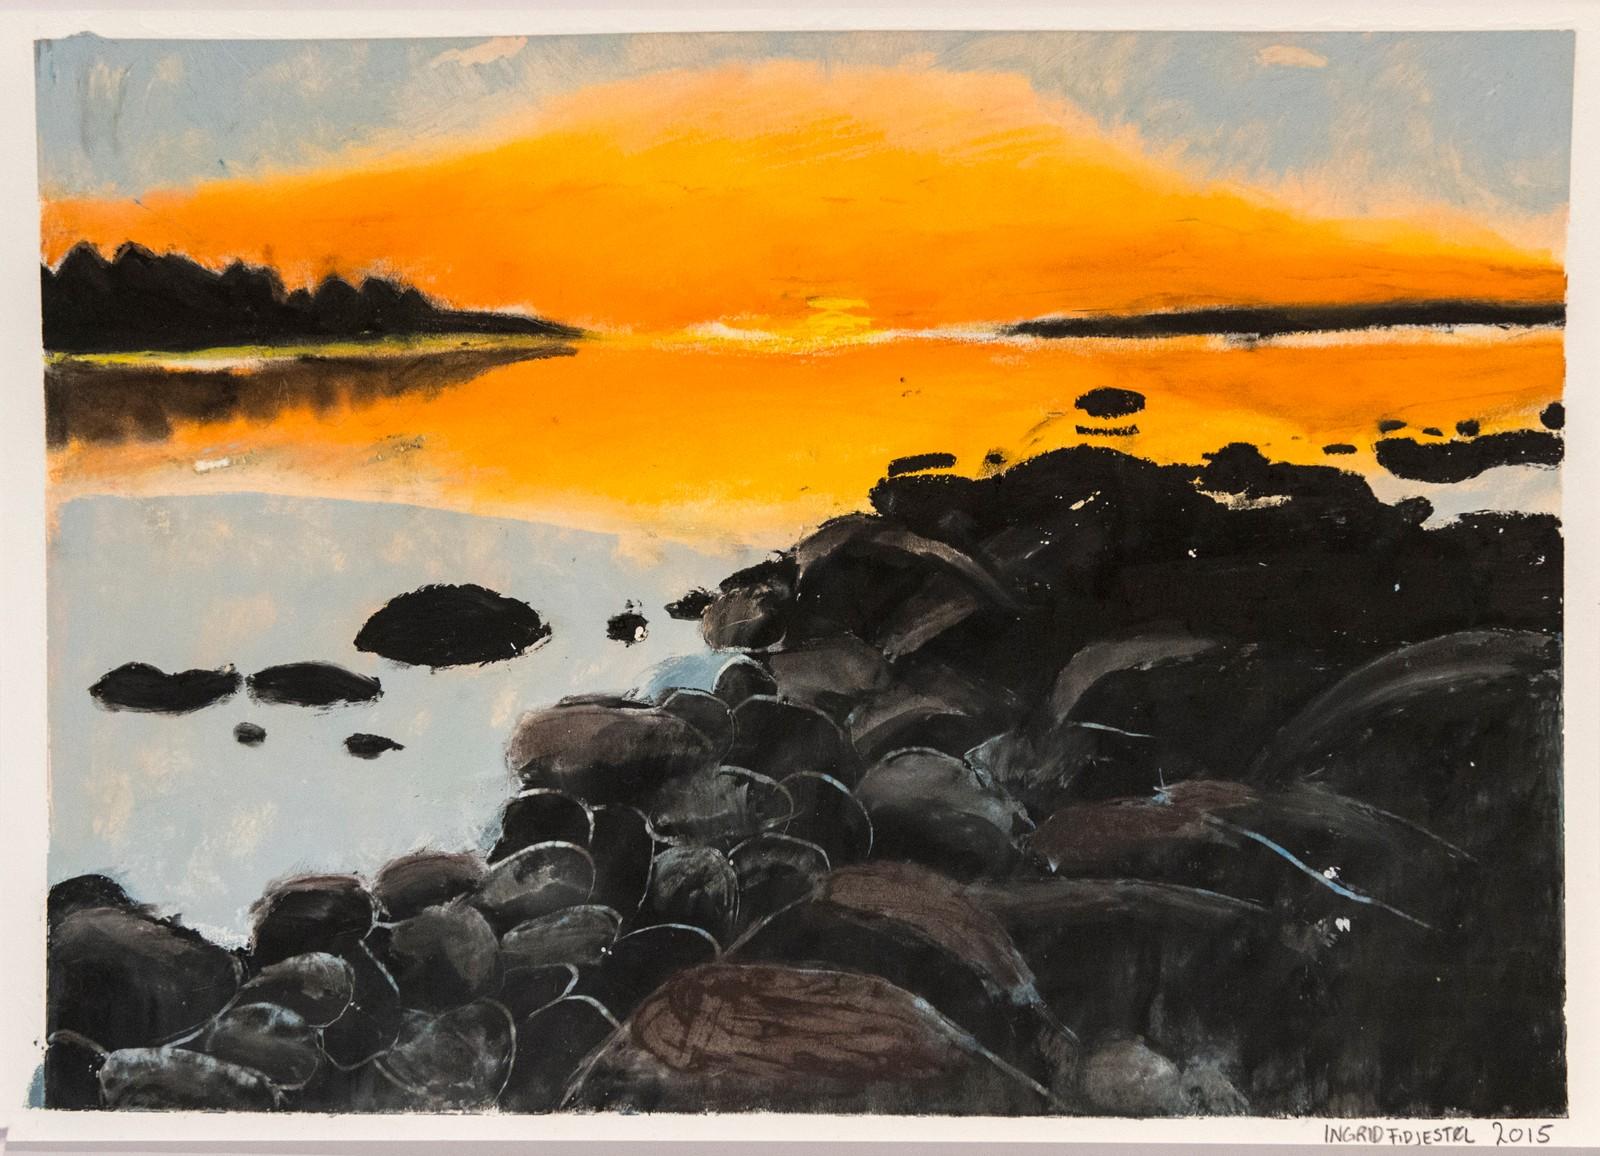 Kveld - Ingrid Fidjestøl, Førde